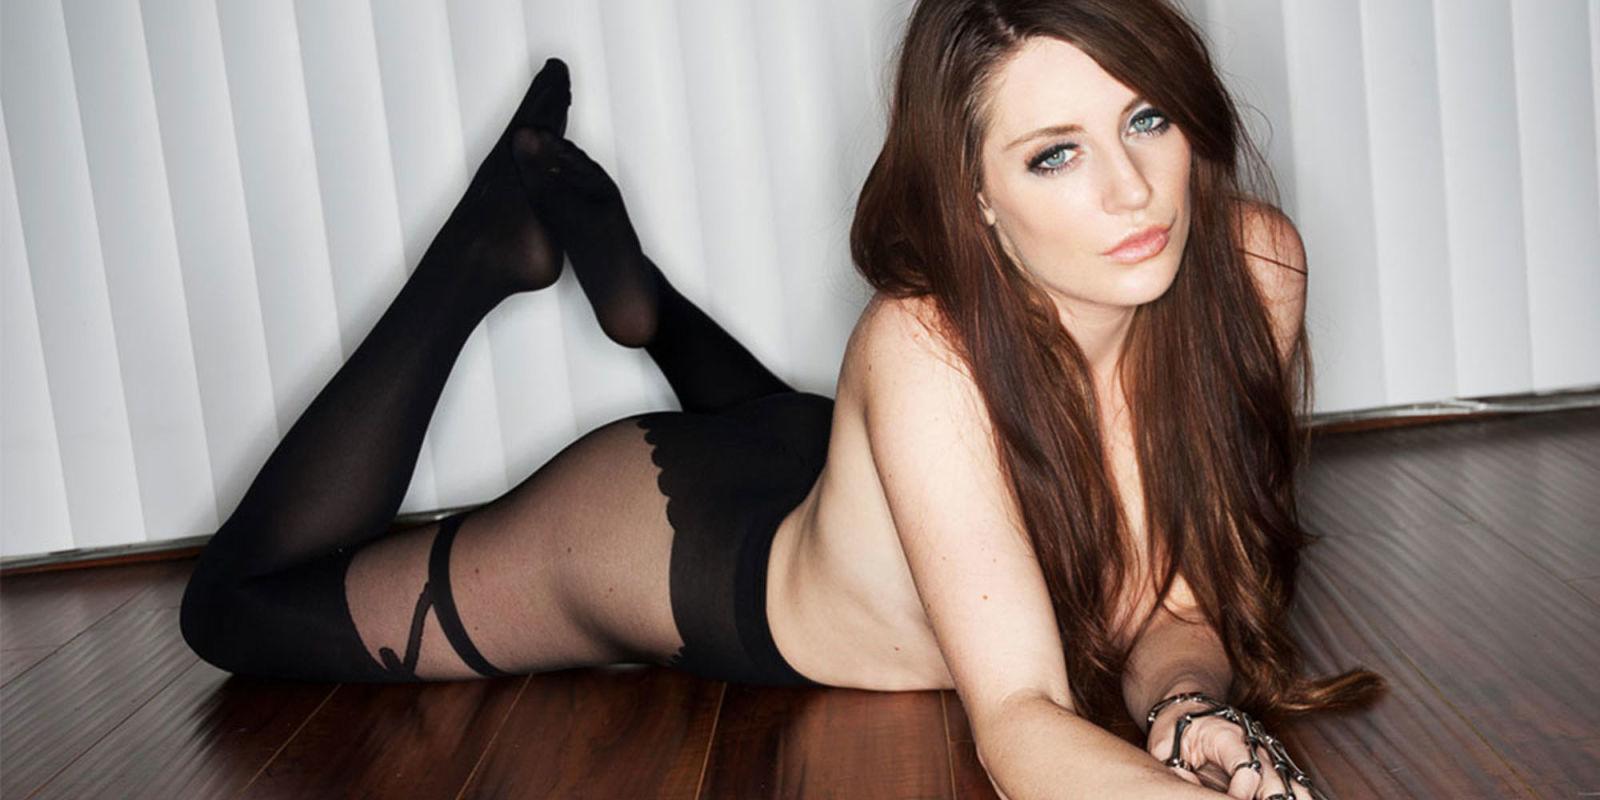 Porn music video nikita double future 10